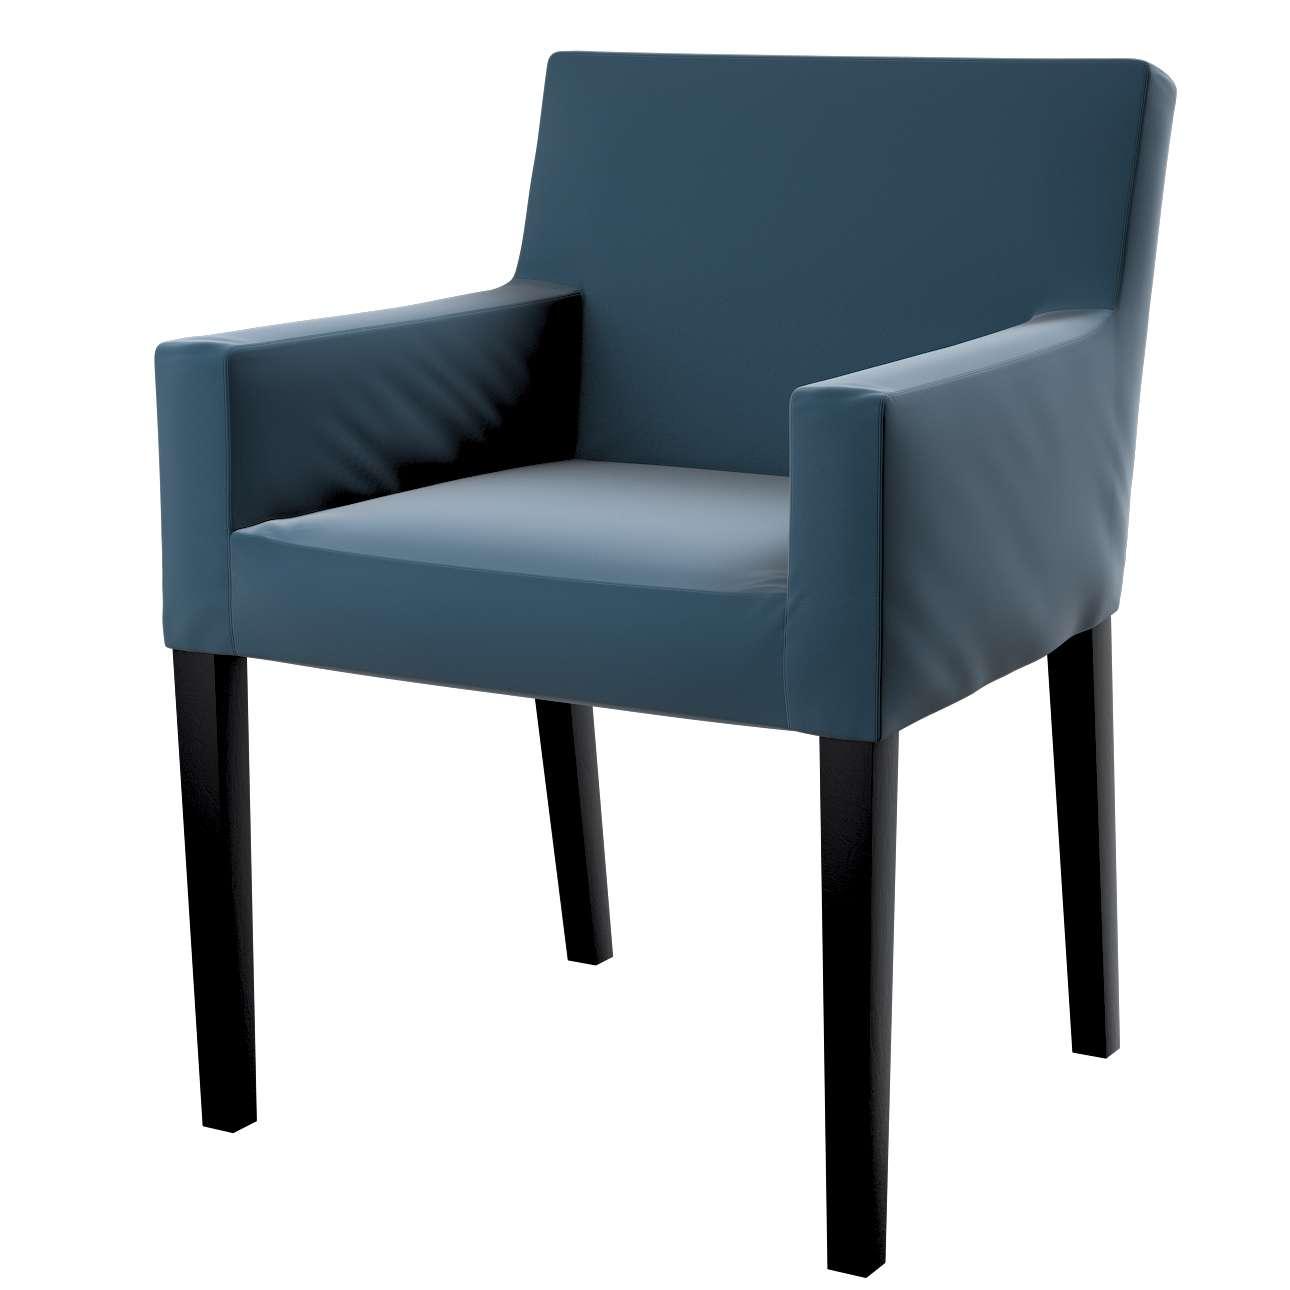 Návlek na stoličku s opierkami Nils V kolekcii Velvet, tkanina: 704-16